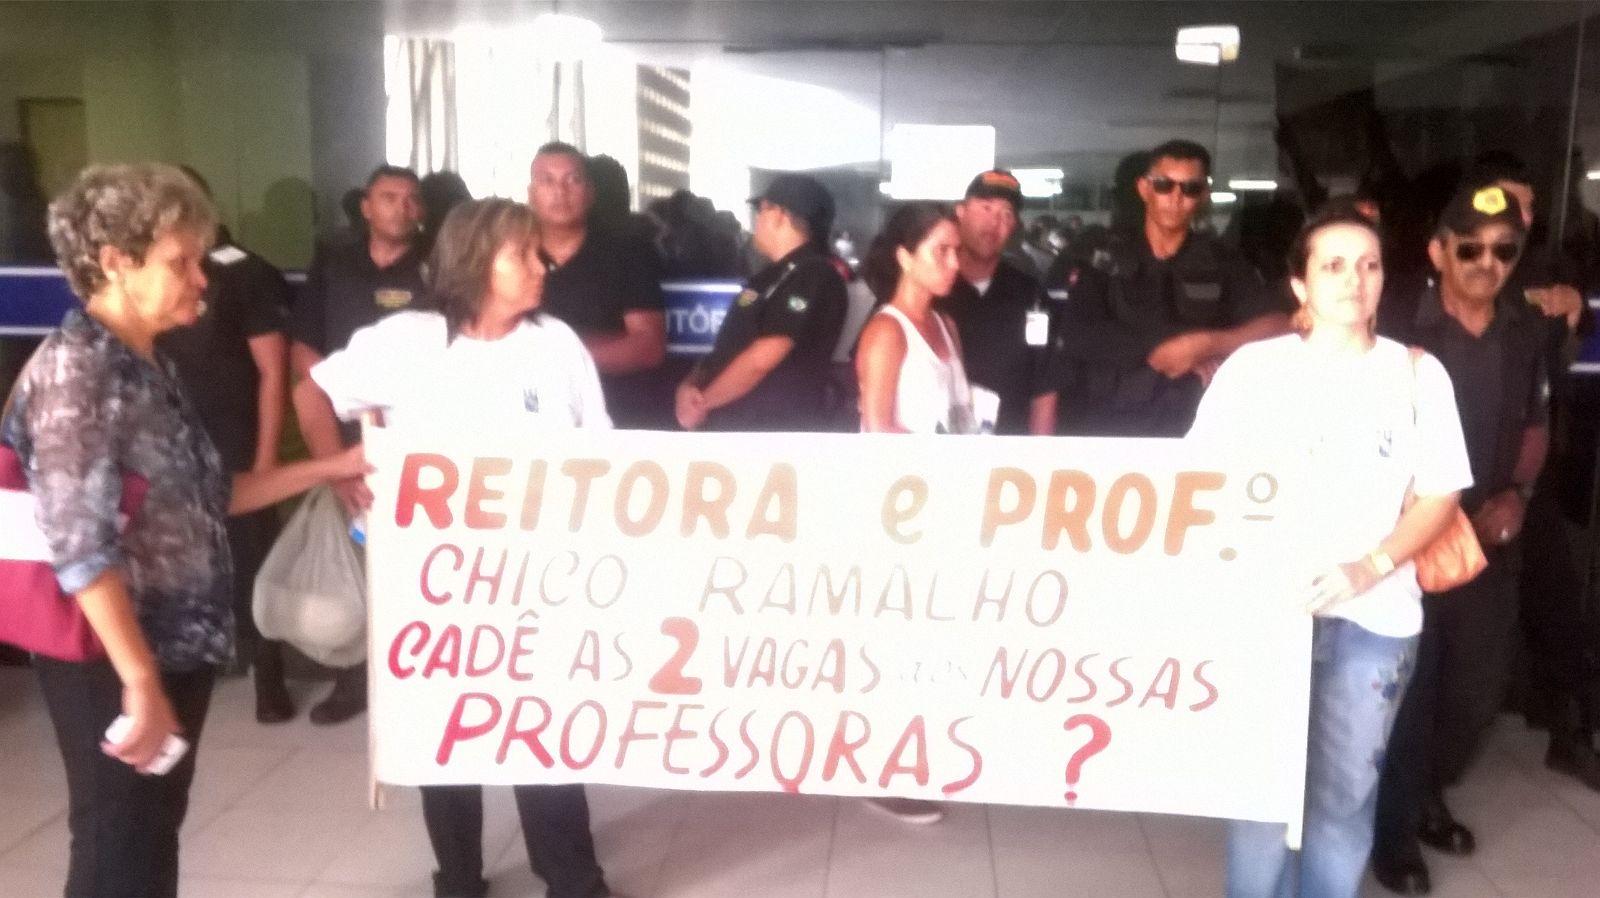 Protesto contra fechamento de escola da UFPB gera tumulto e confusão